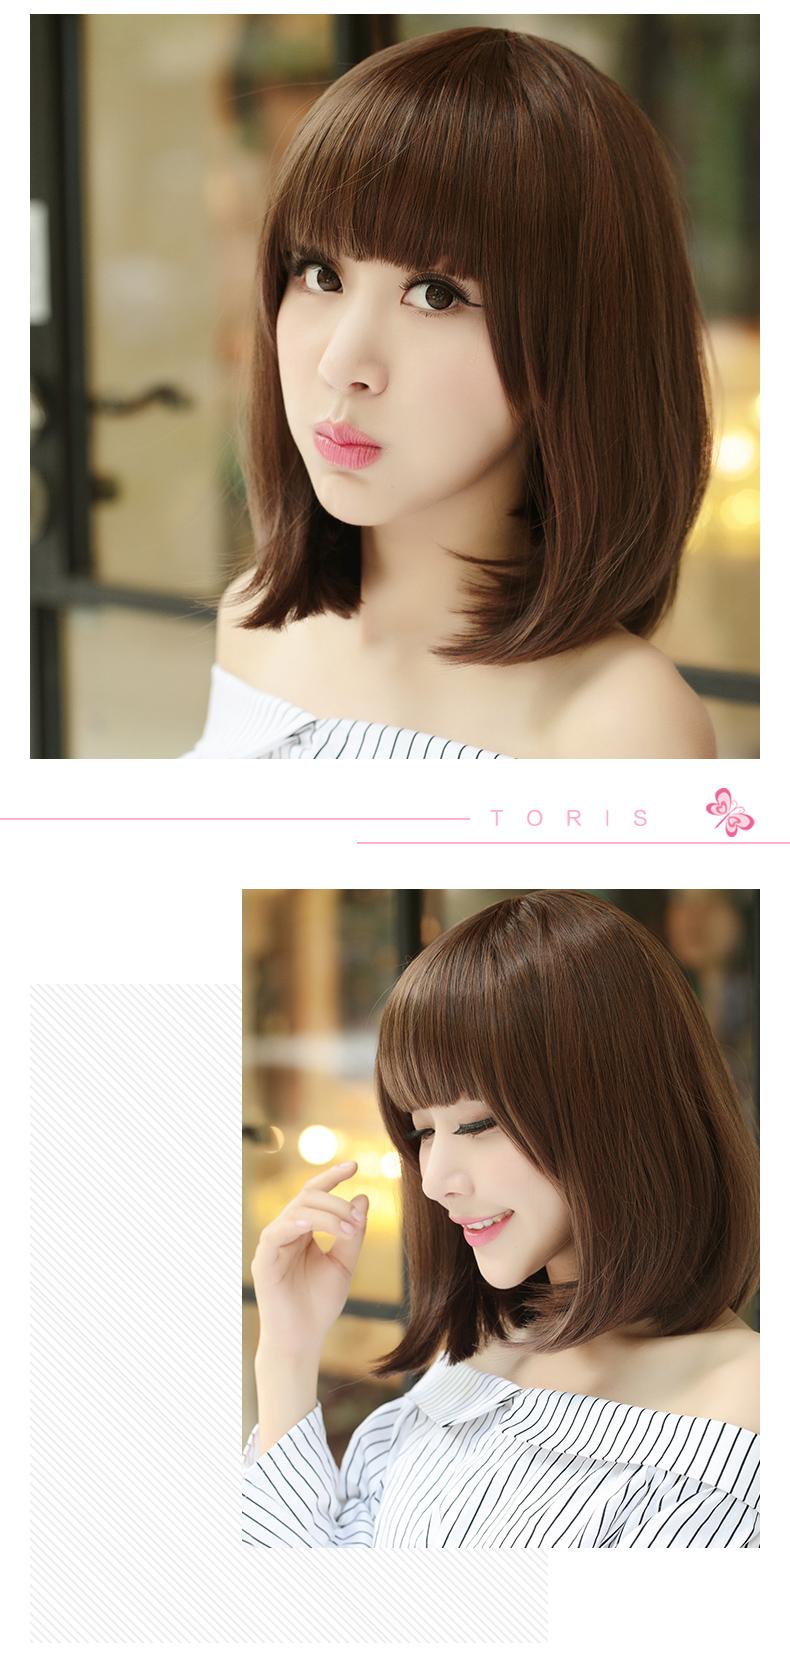 shangke假发 女生短发假发bobo头沙宣头短直发假发套发型 浅棕色